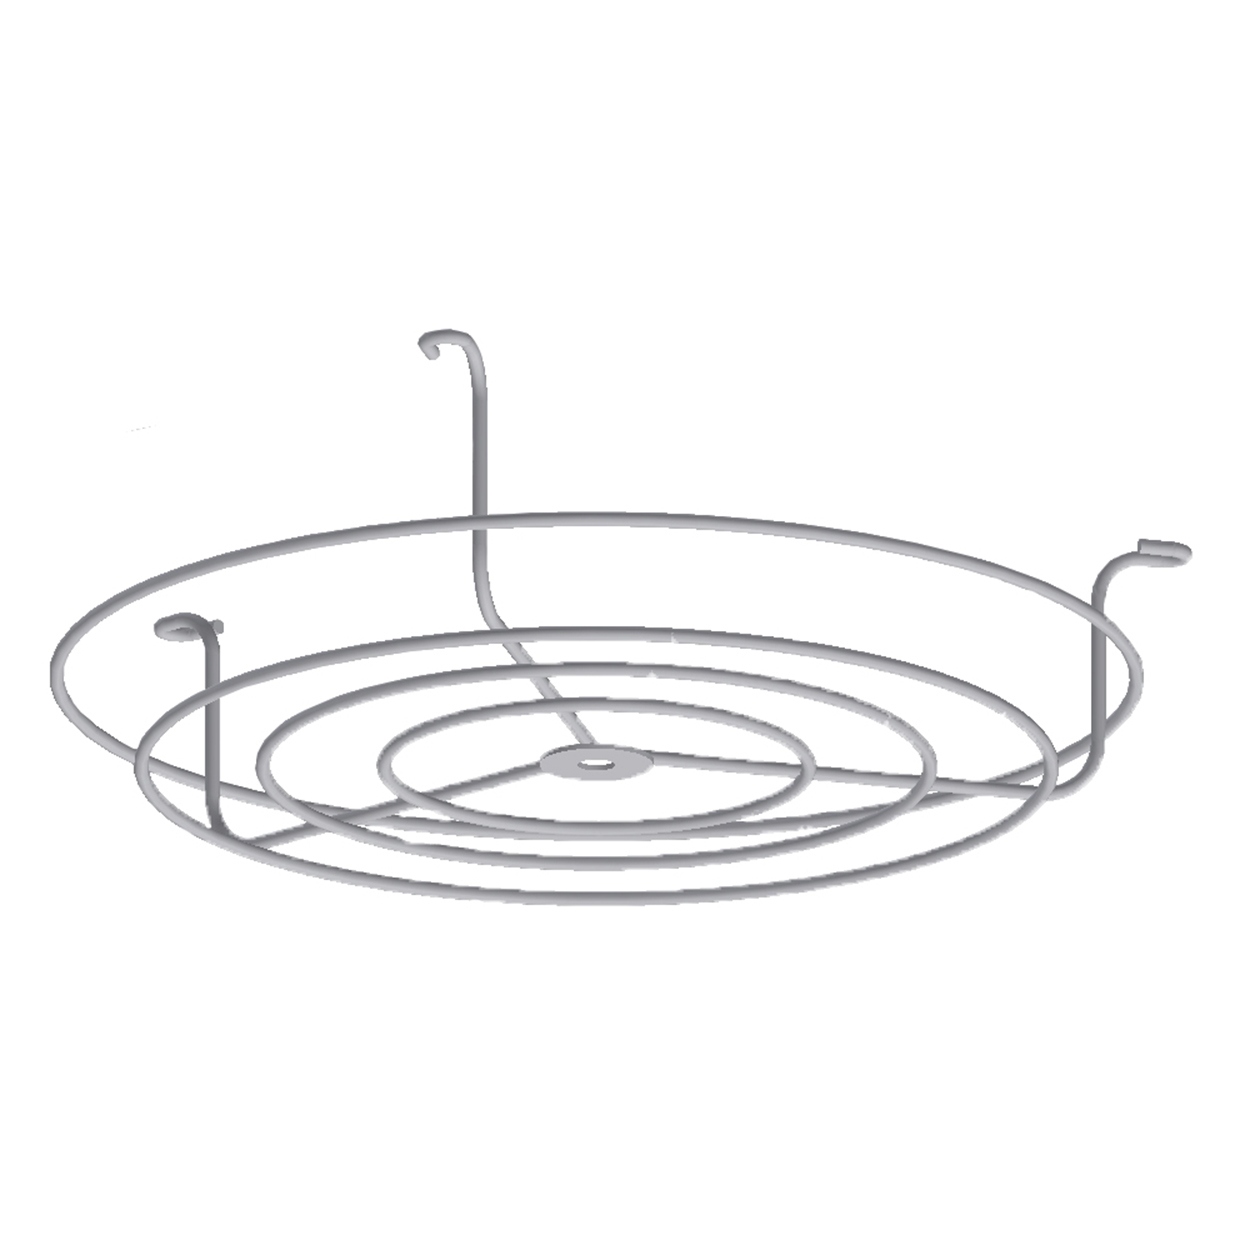 appleton mgu1 mm guard for glass globe